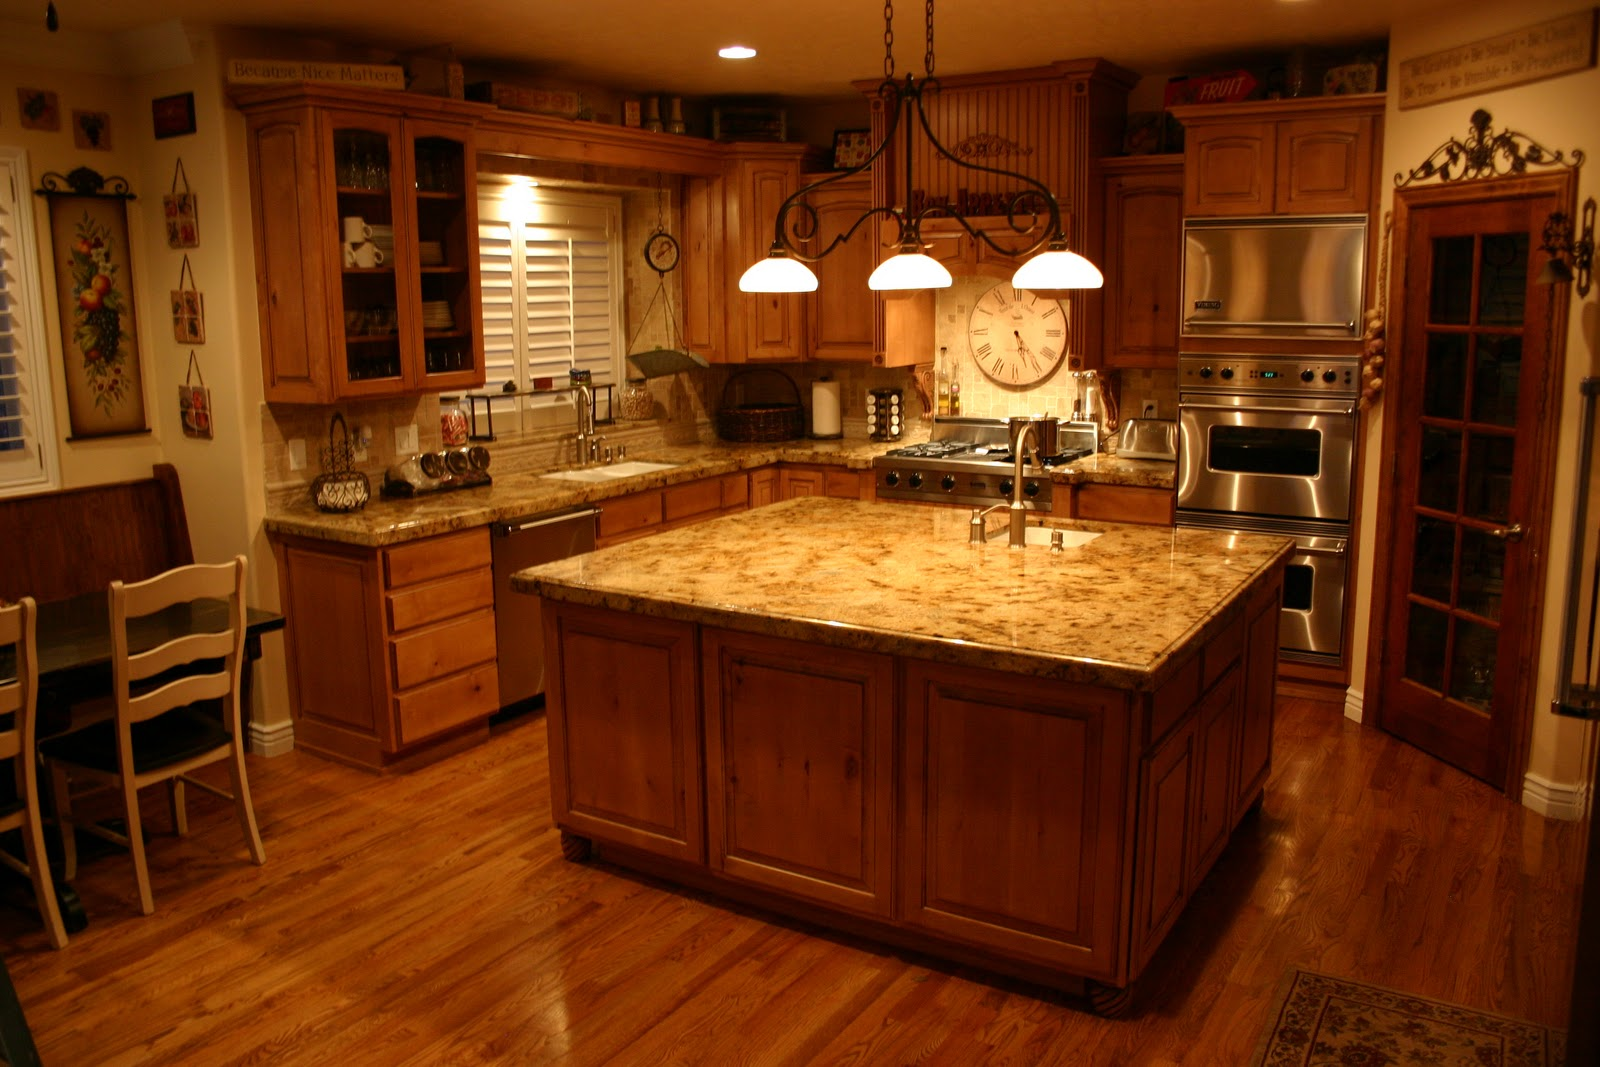 granite kitchen designs photo - 10